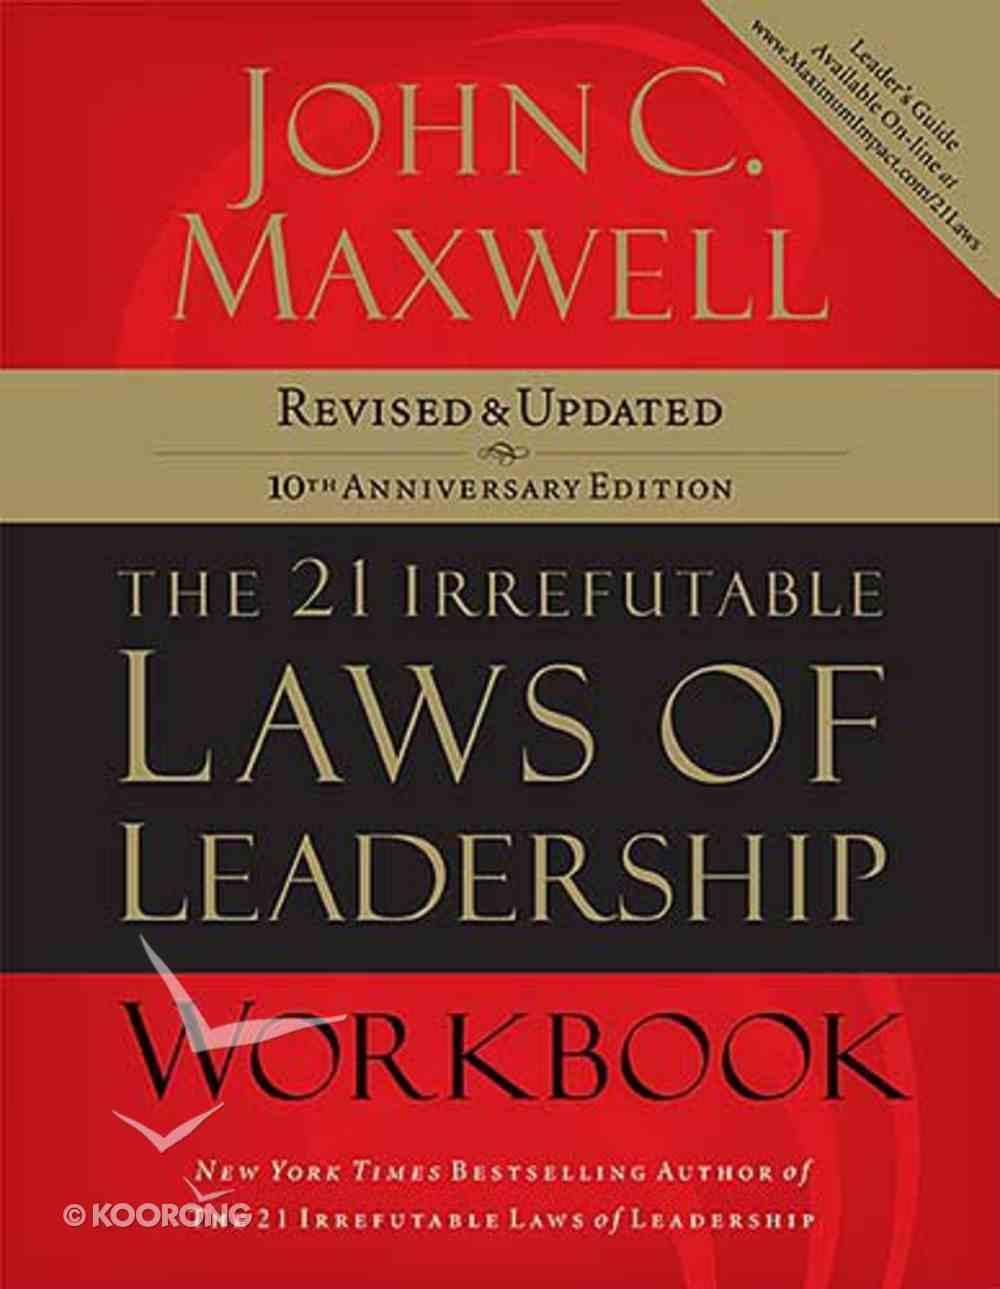 21 Irrefutable Laws of Leadership (Workbook) Paperback